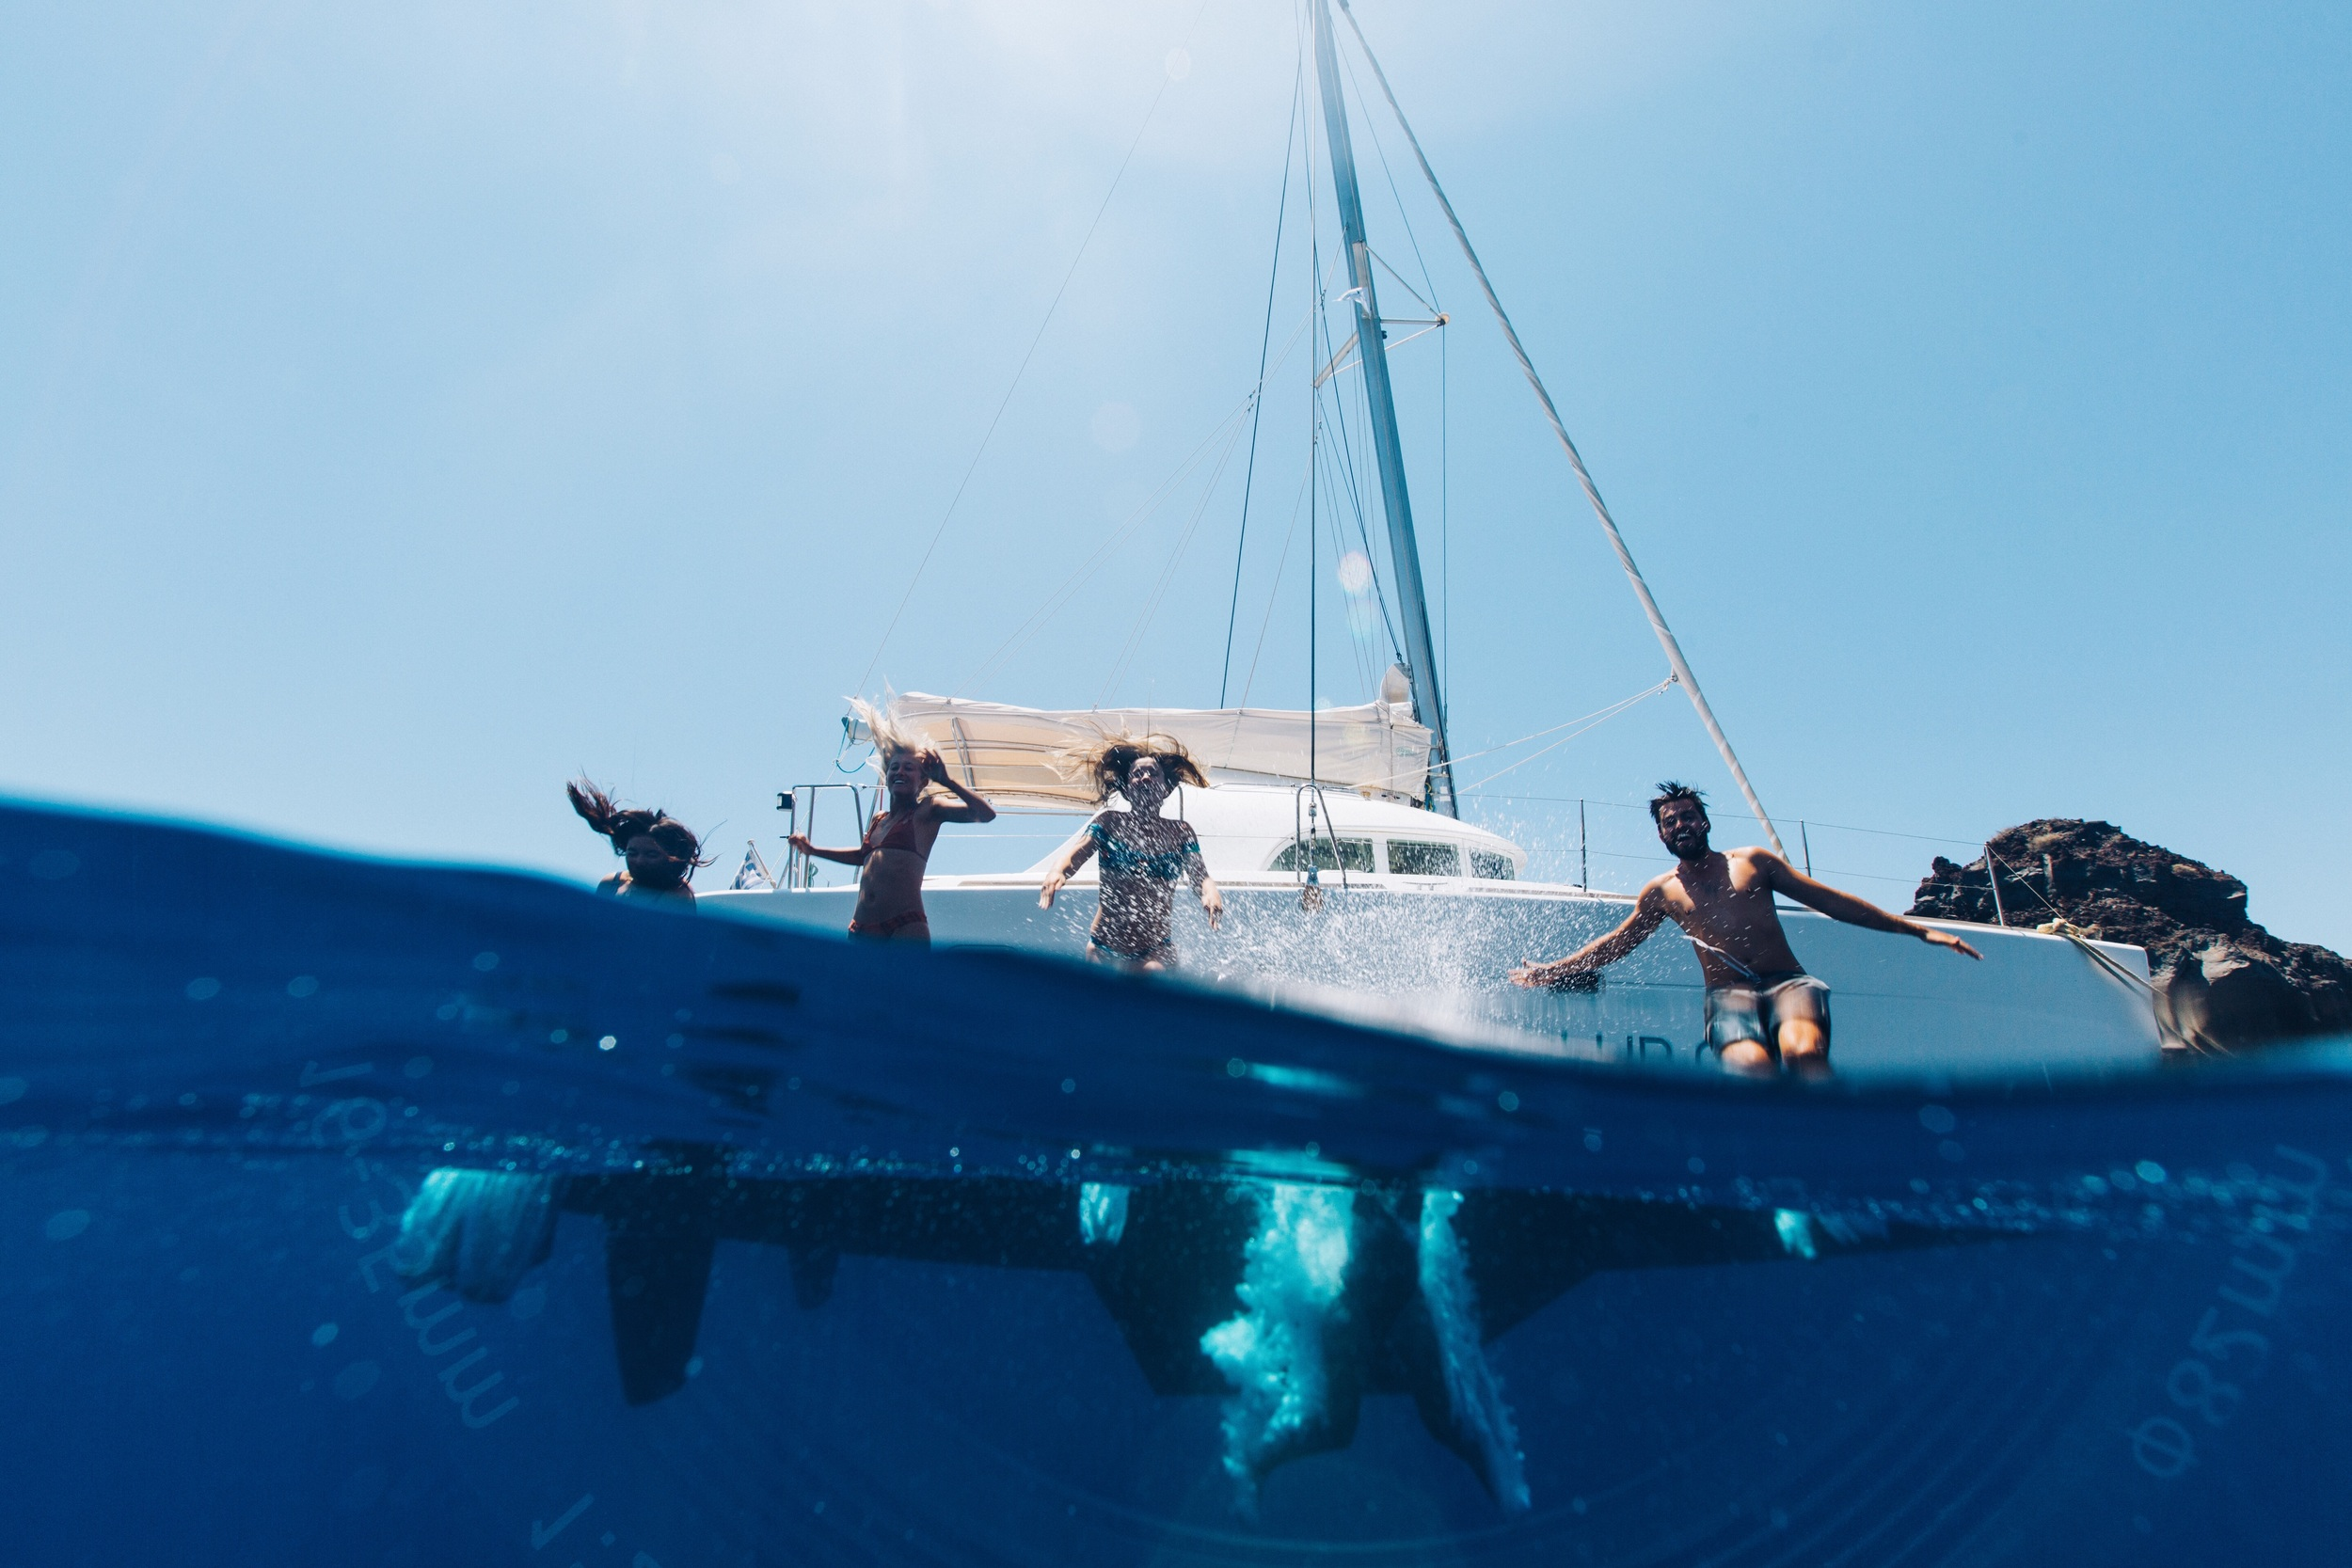 Part 2: Sailing around Santorini